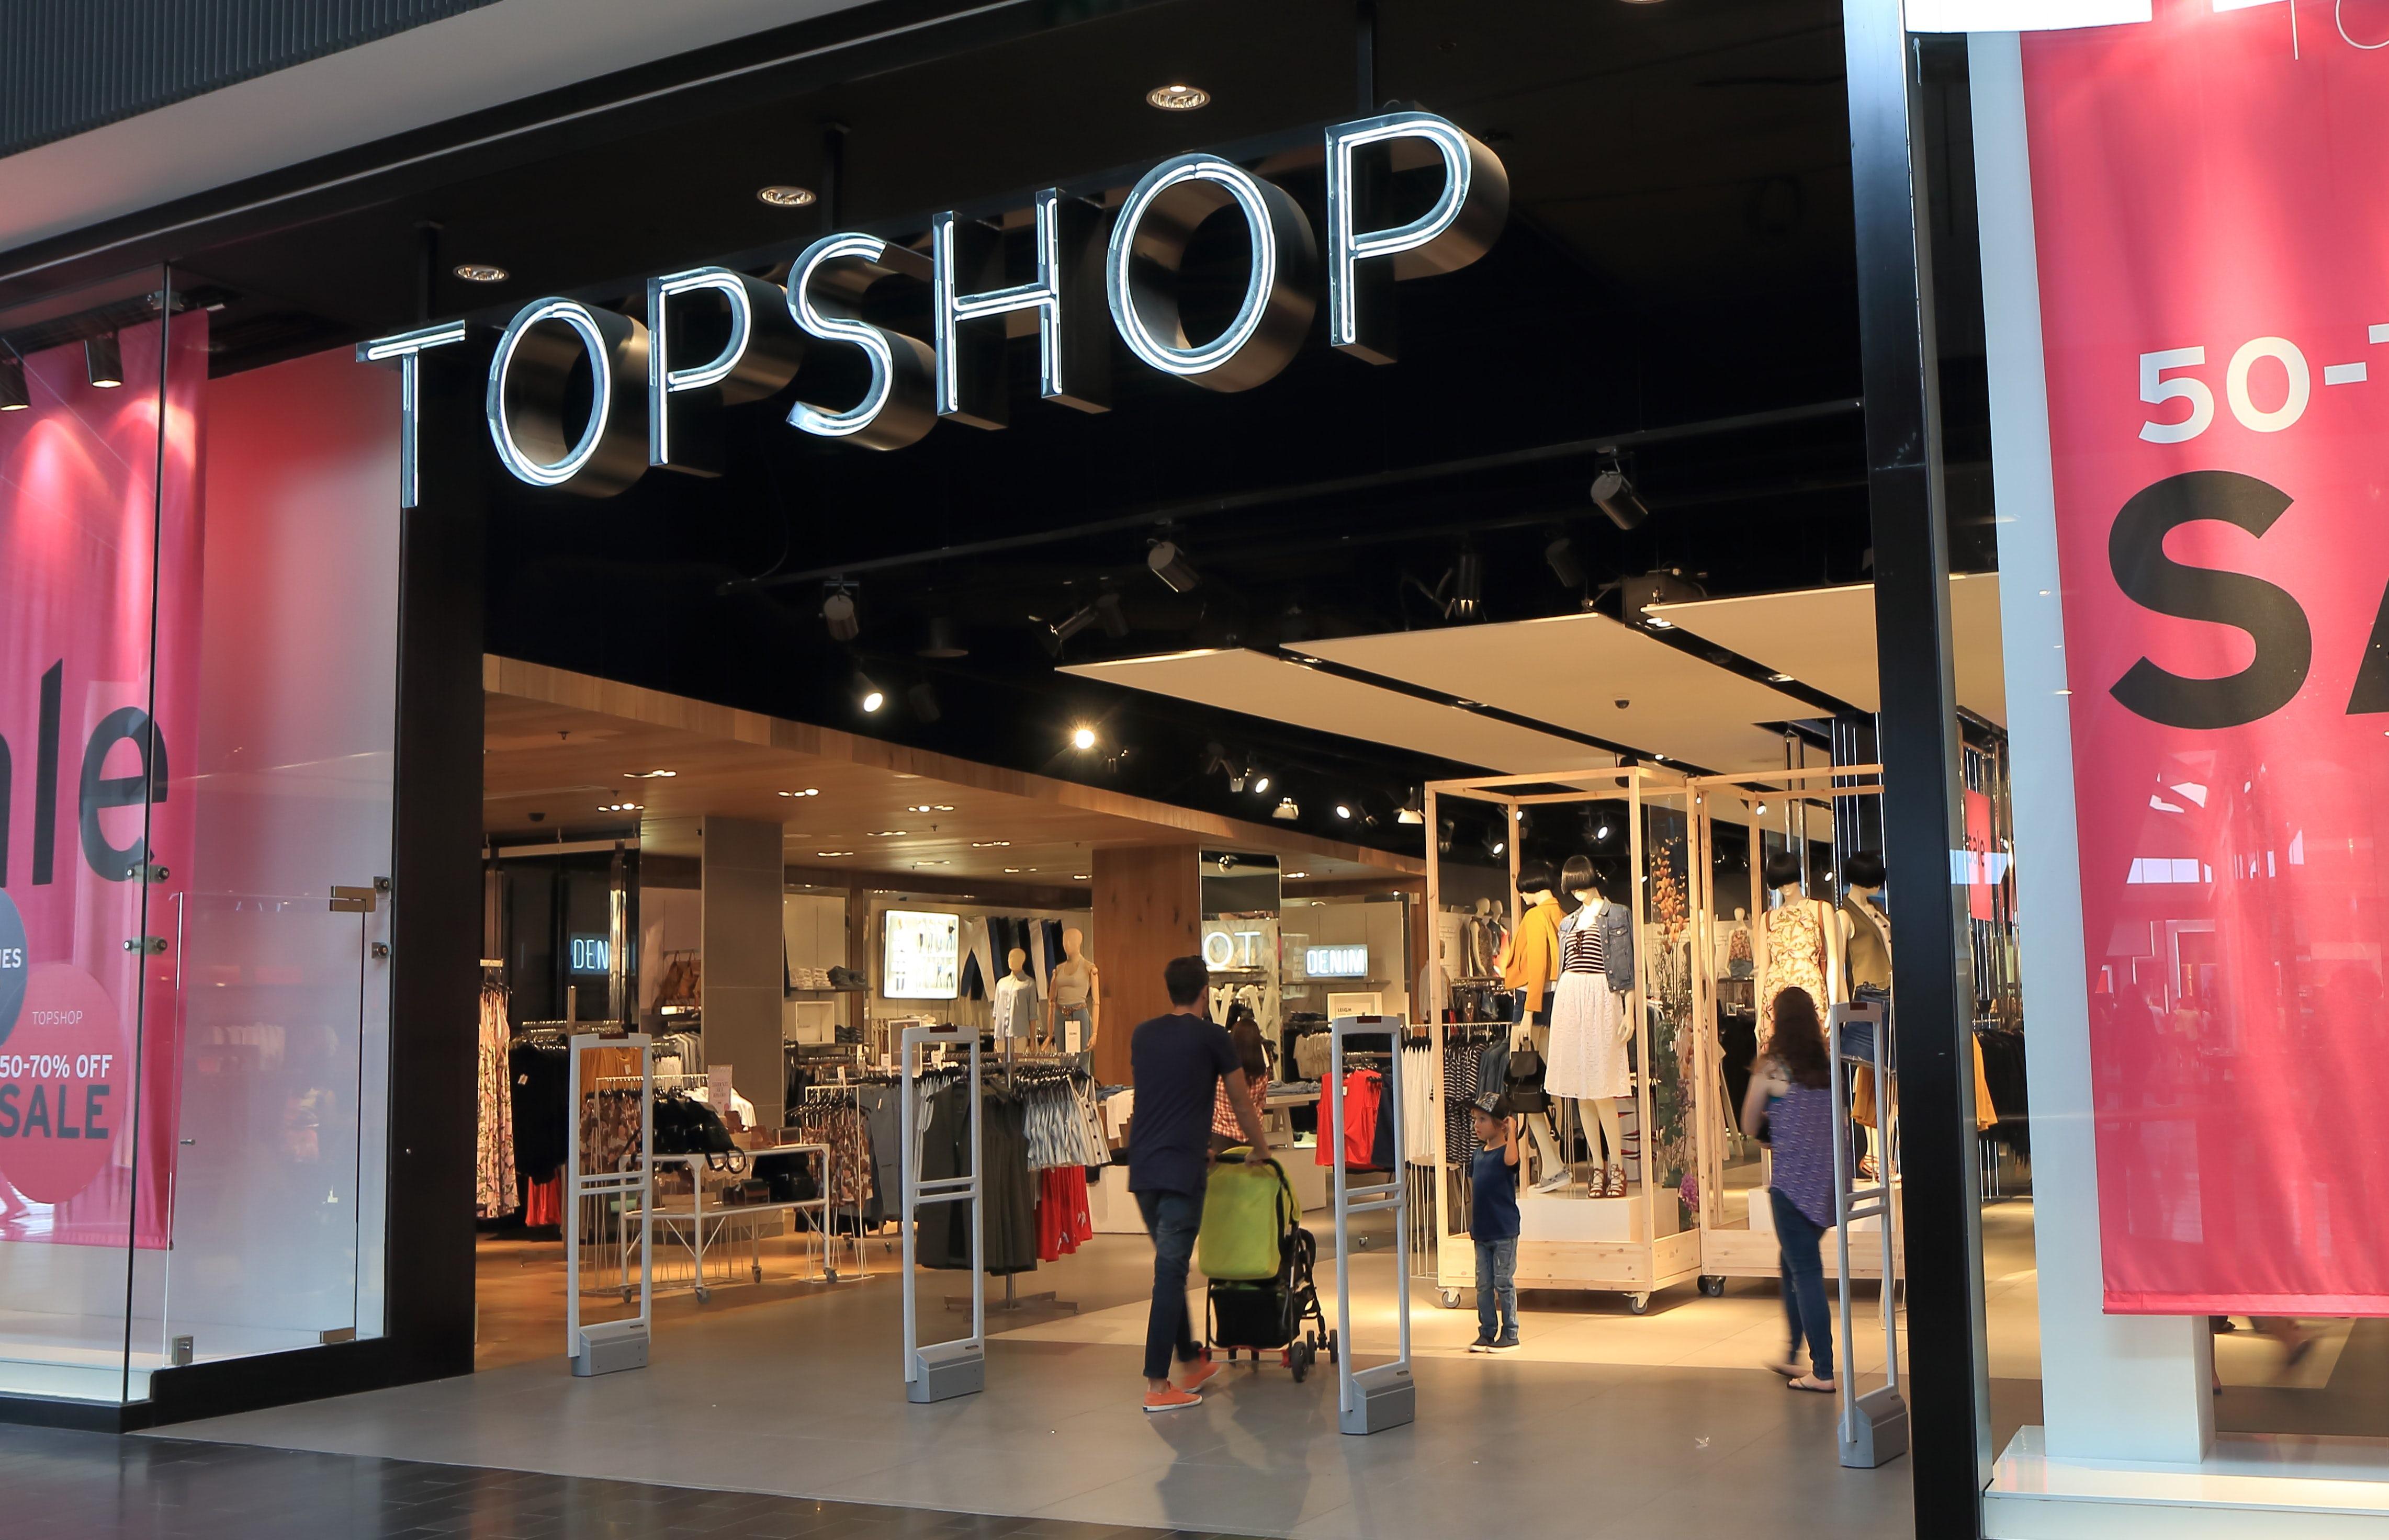 A Topshop store | Source: Shutterstock